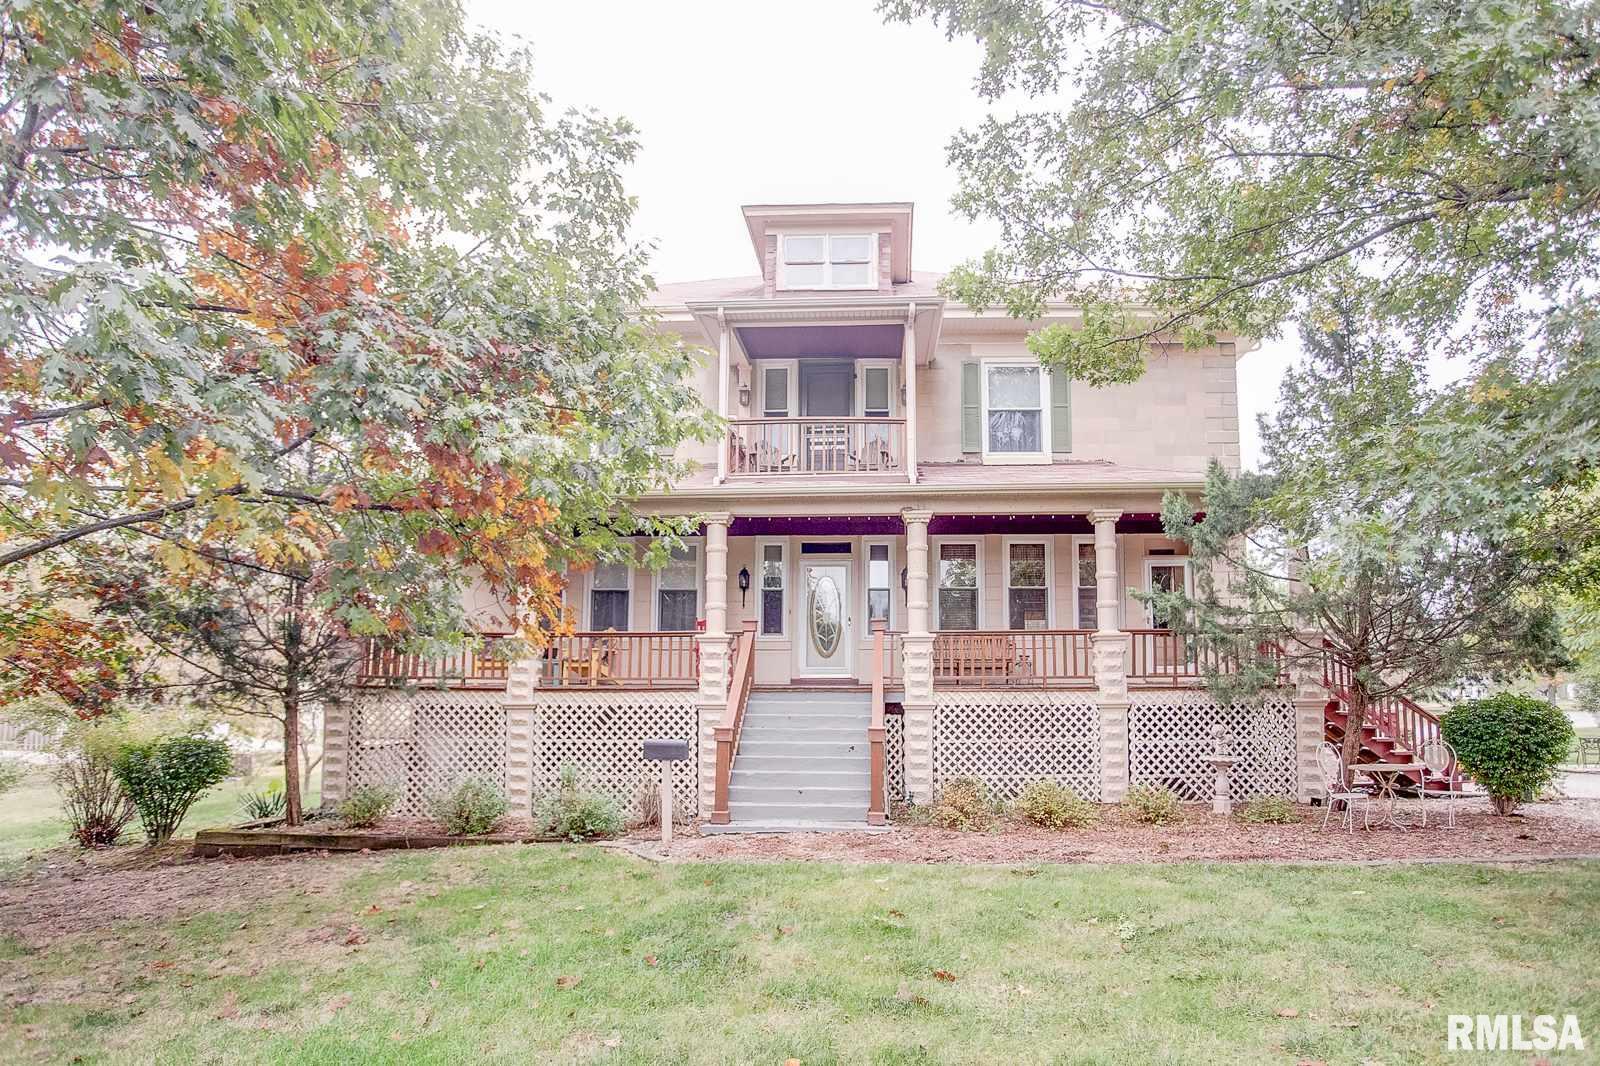 104 S Line Property Photo - Duquoin, IL real estate listing